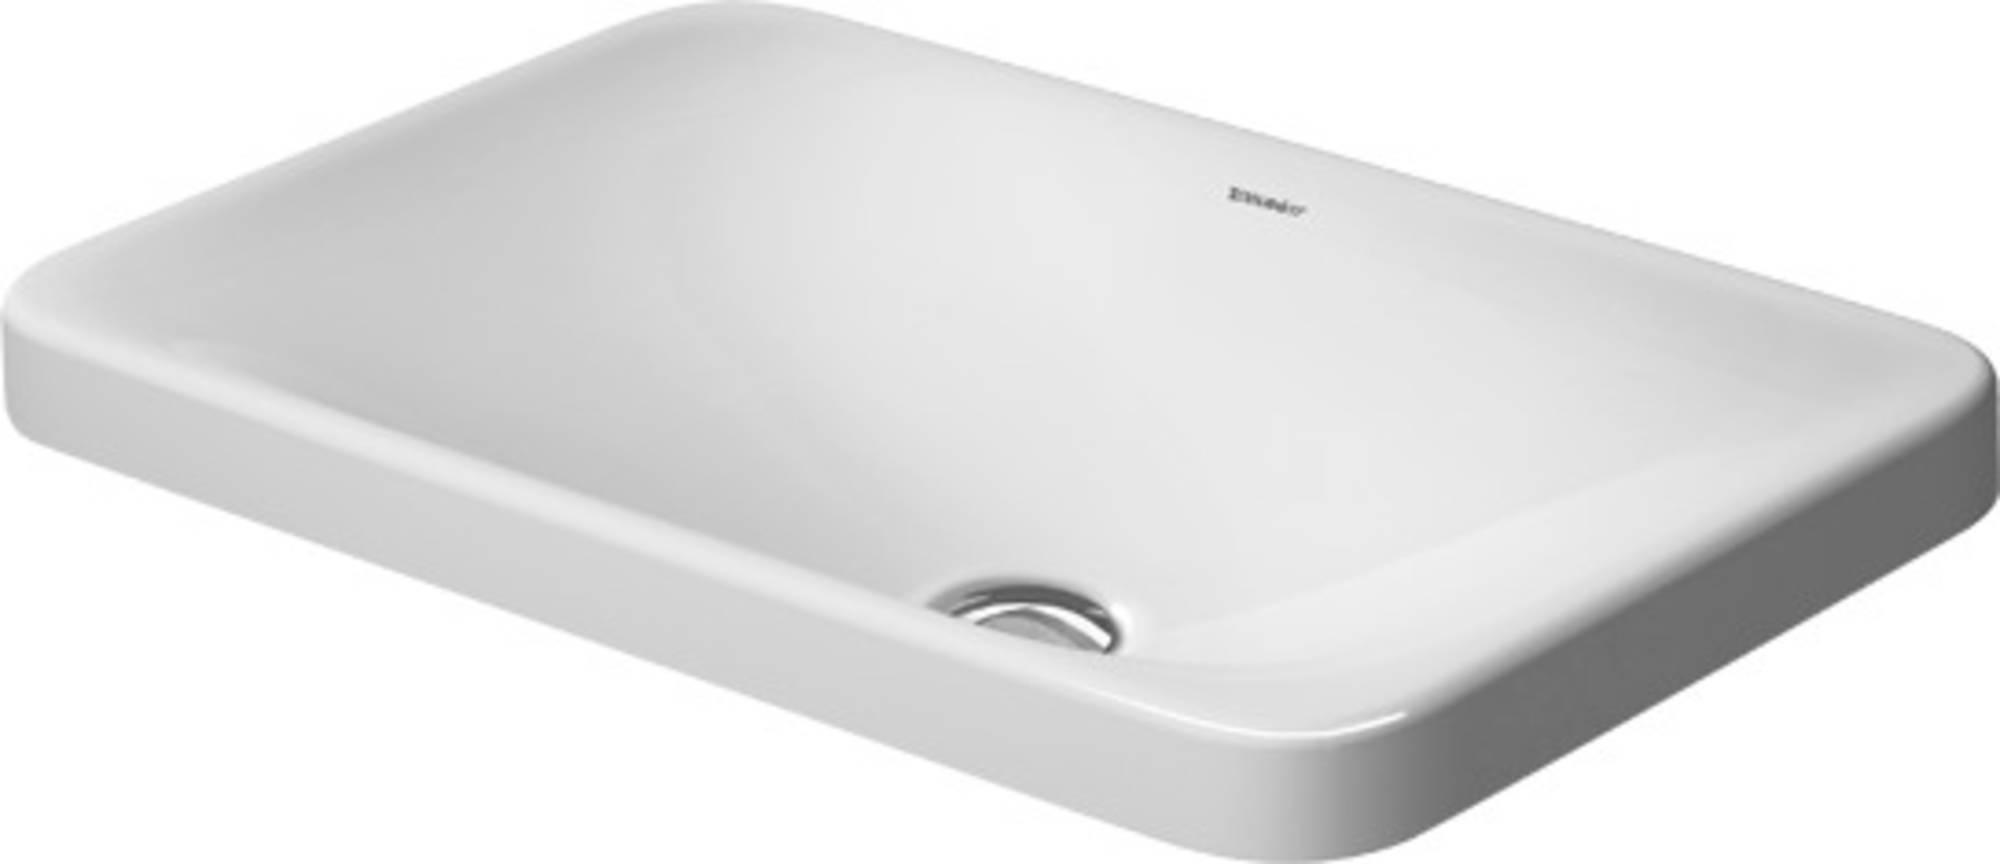 Duravit P3 Comforts Inbouwwastafel 55cm wit